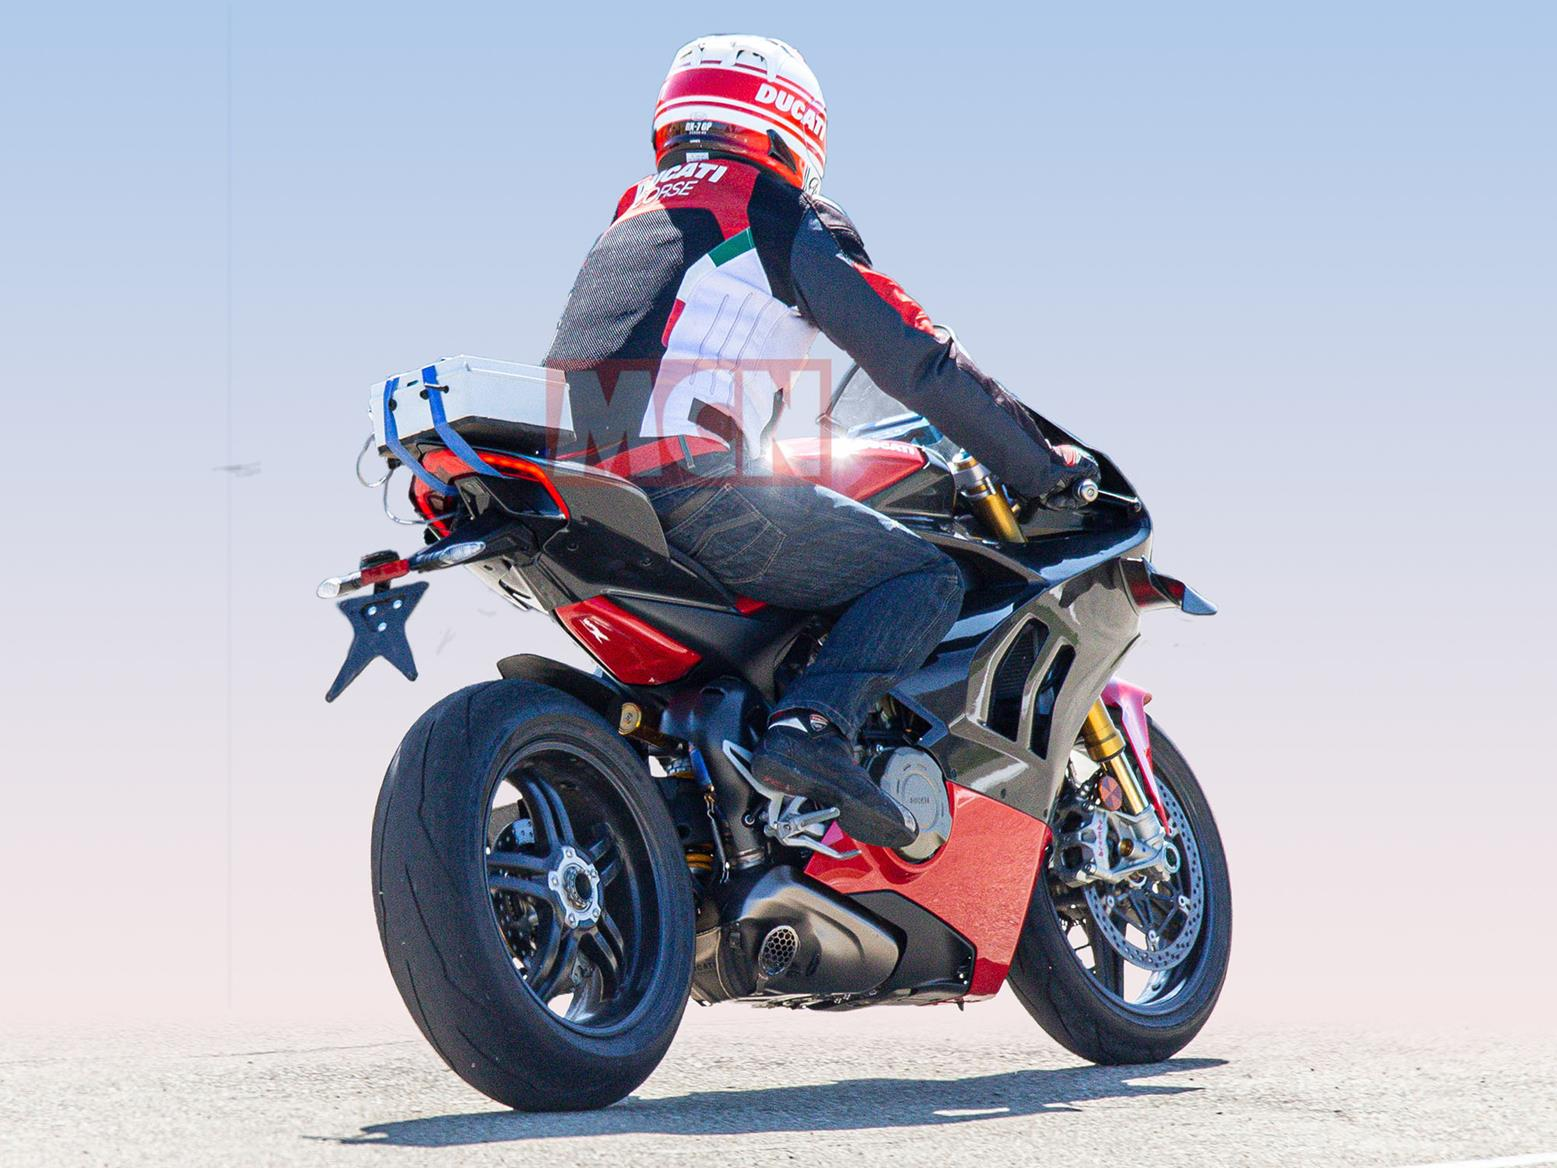 Rear view of 2020 Ducati Panigale V4 Superleggera